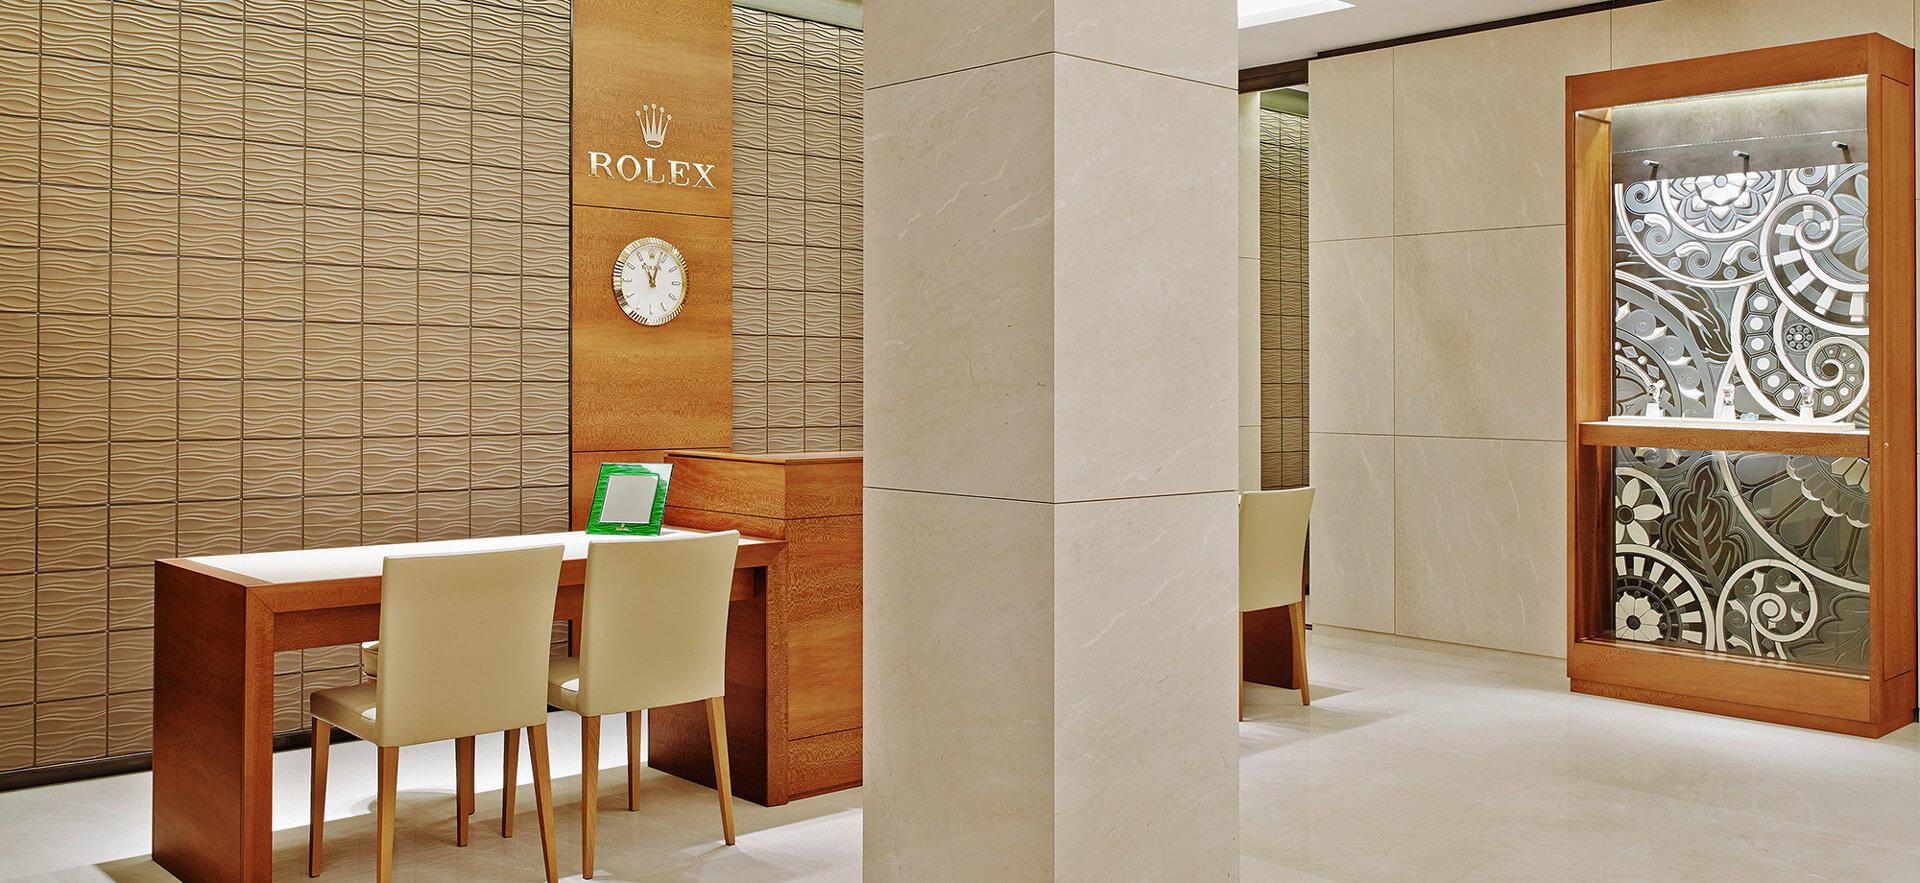 Rolex butik - Beograd - Petite Geneve Petrovic